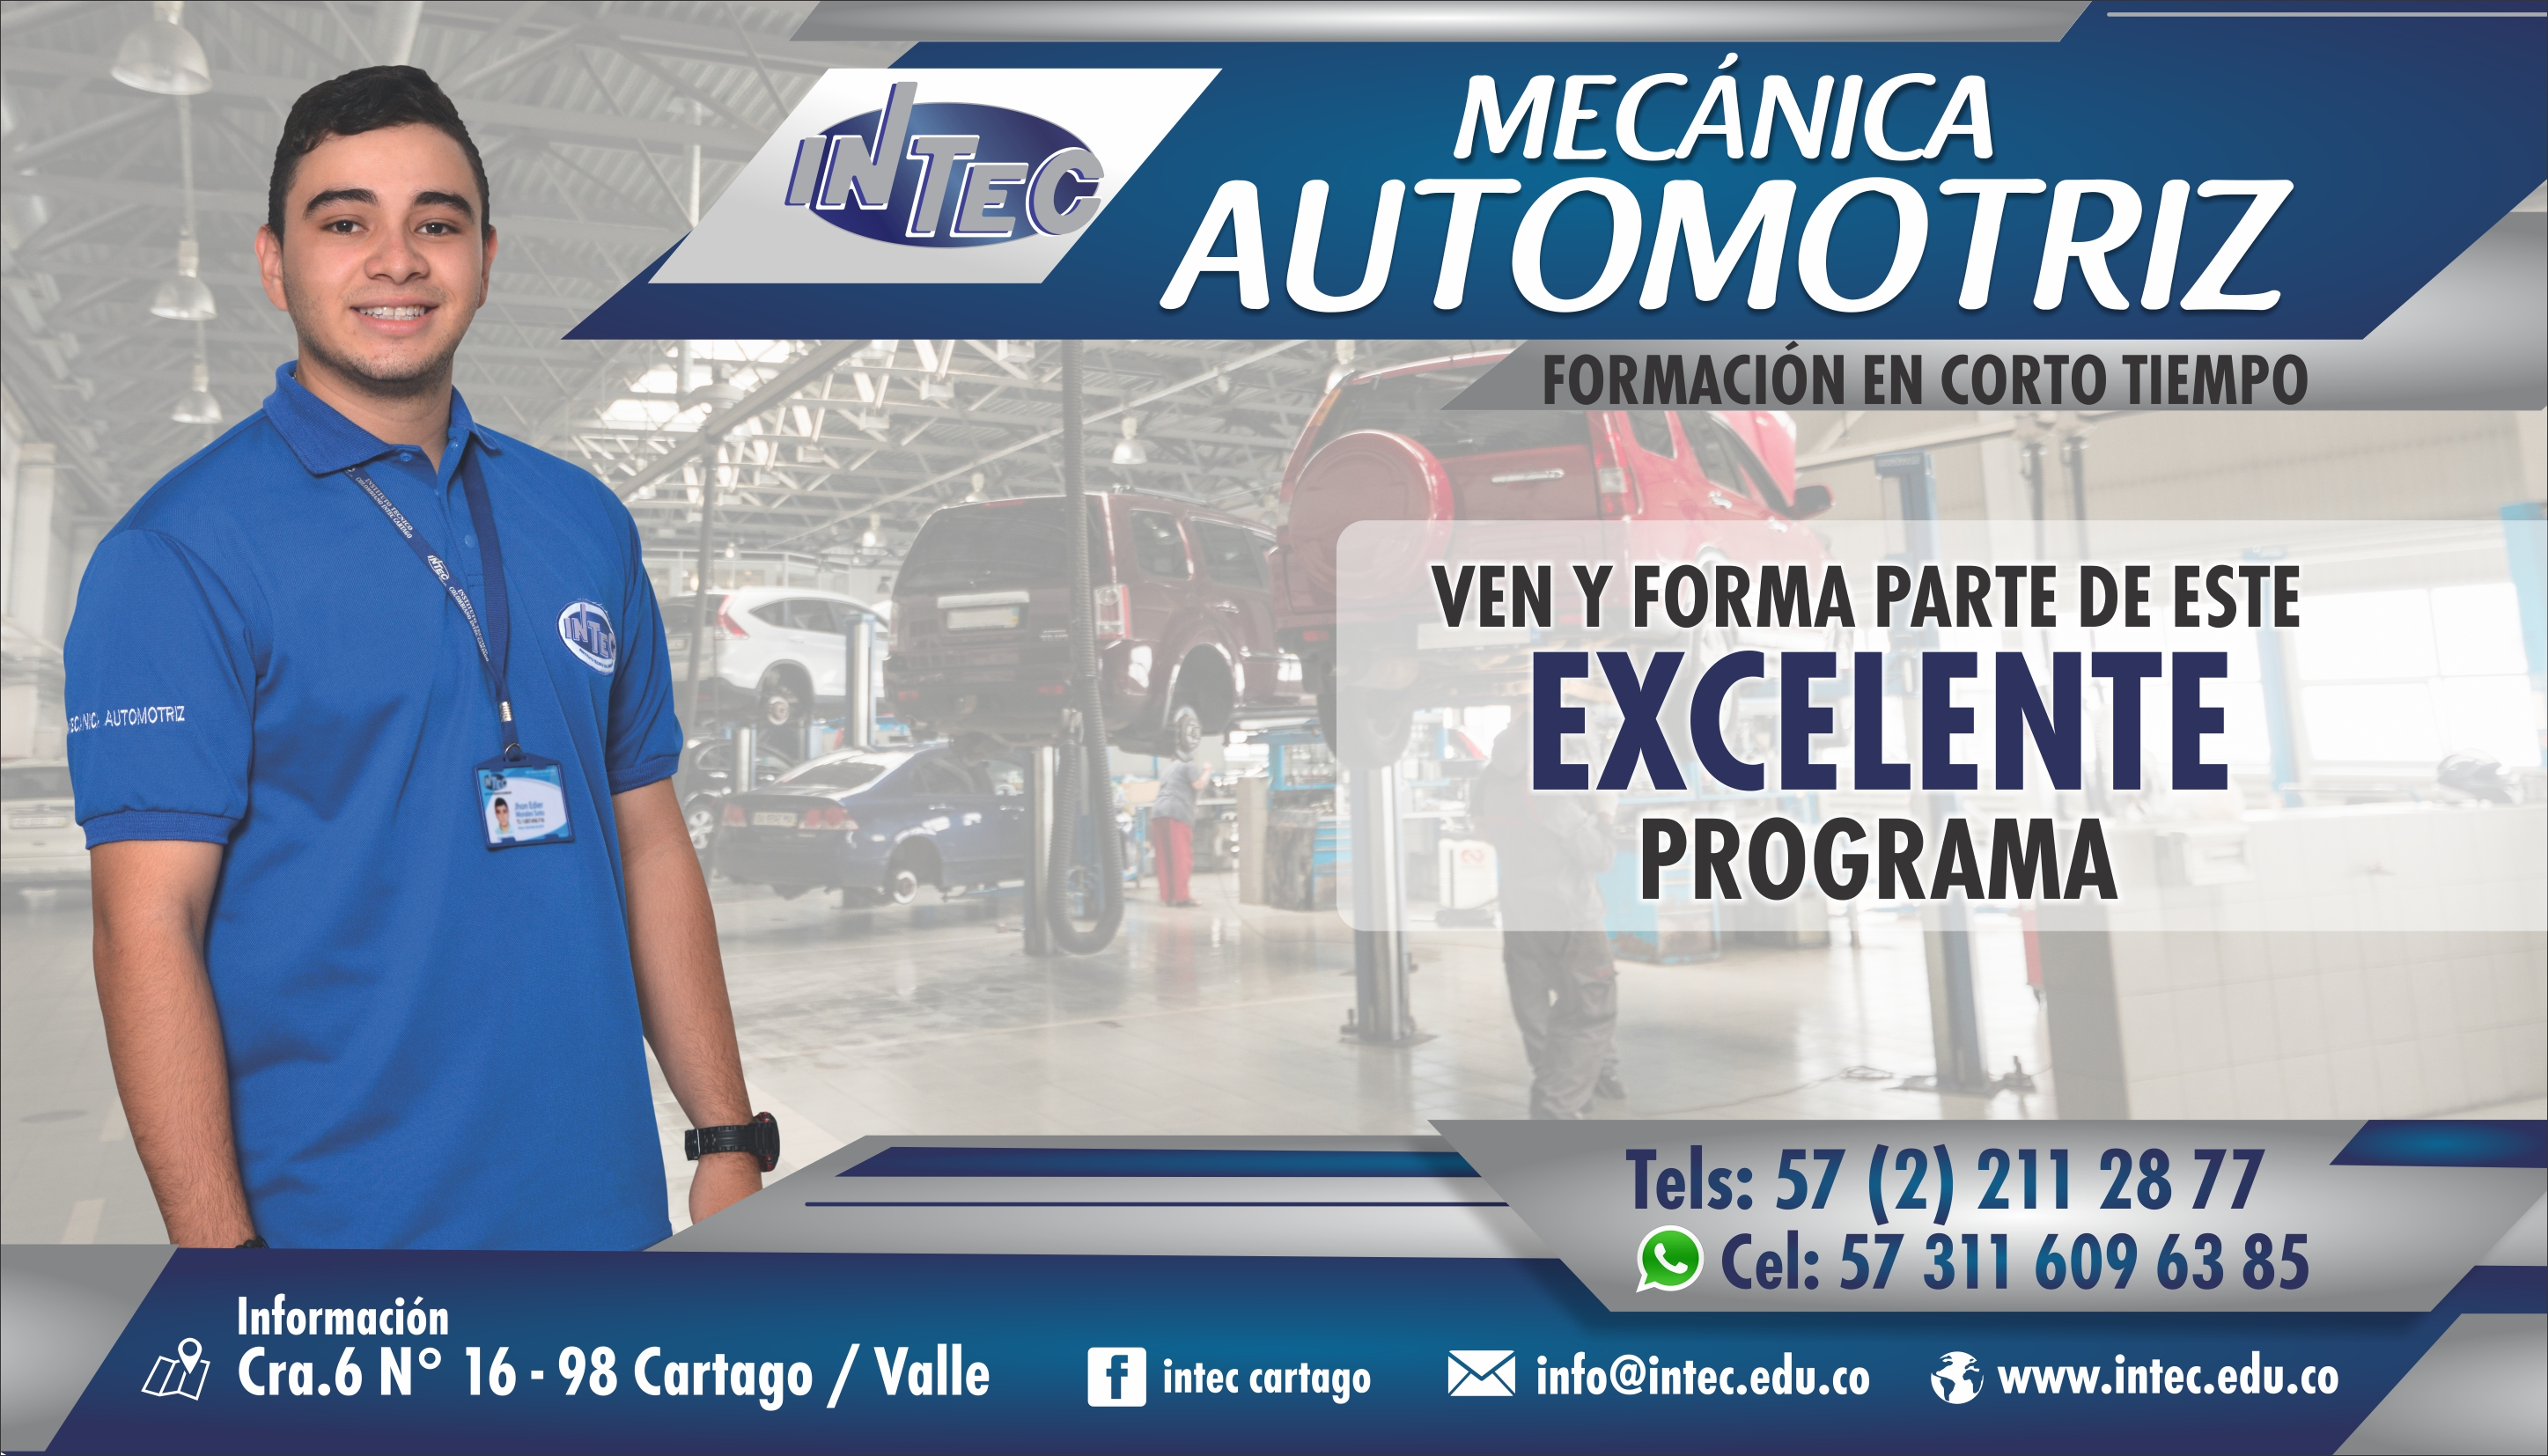 MECANICA AUTOMOTRIX